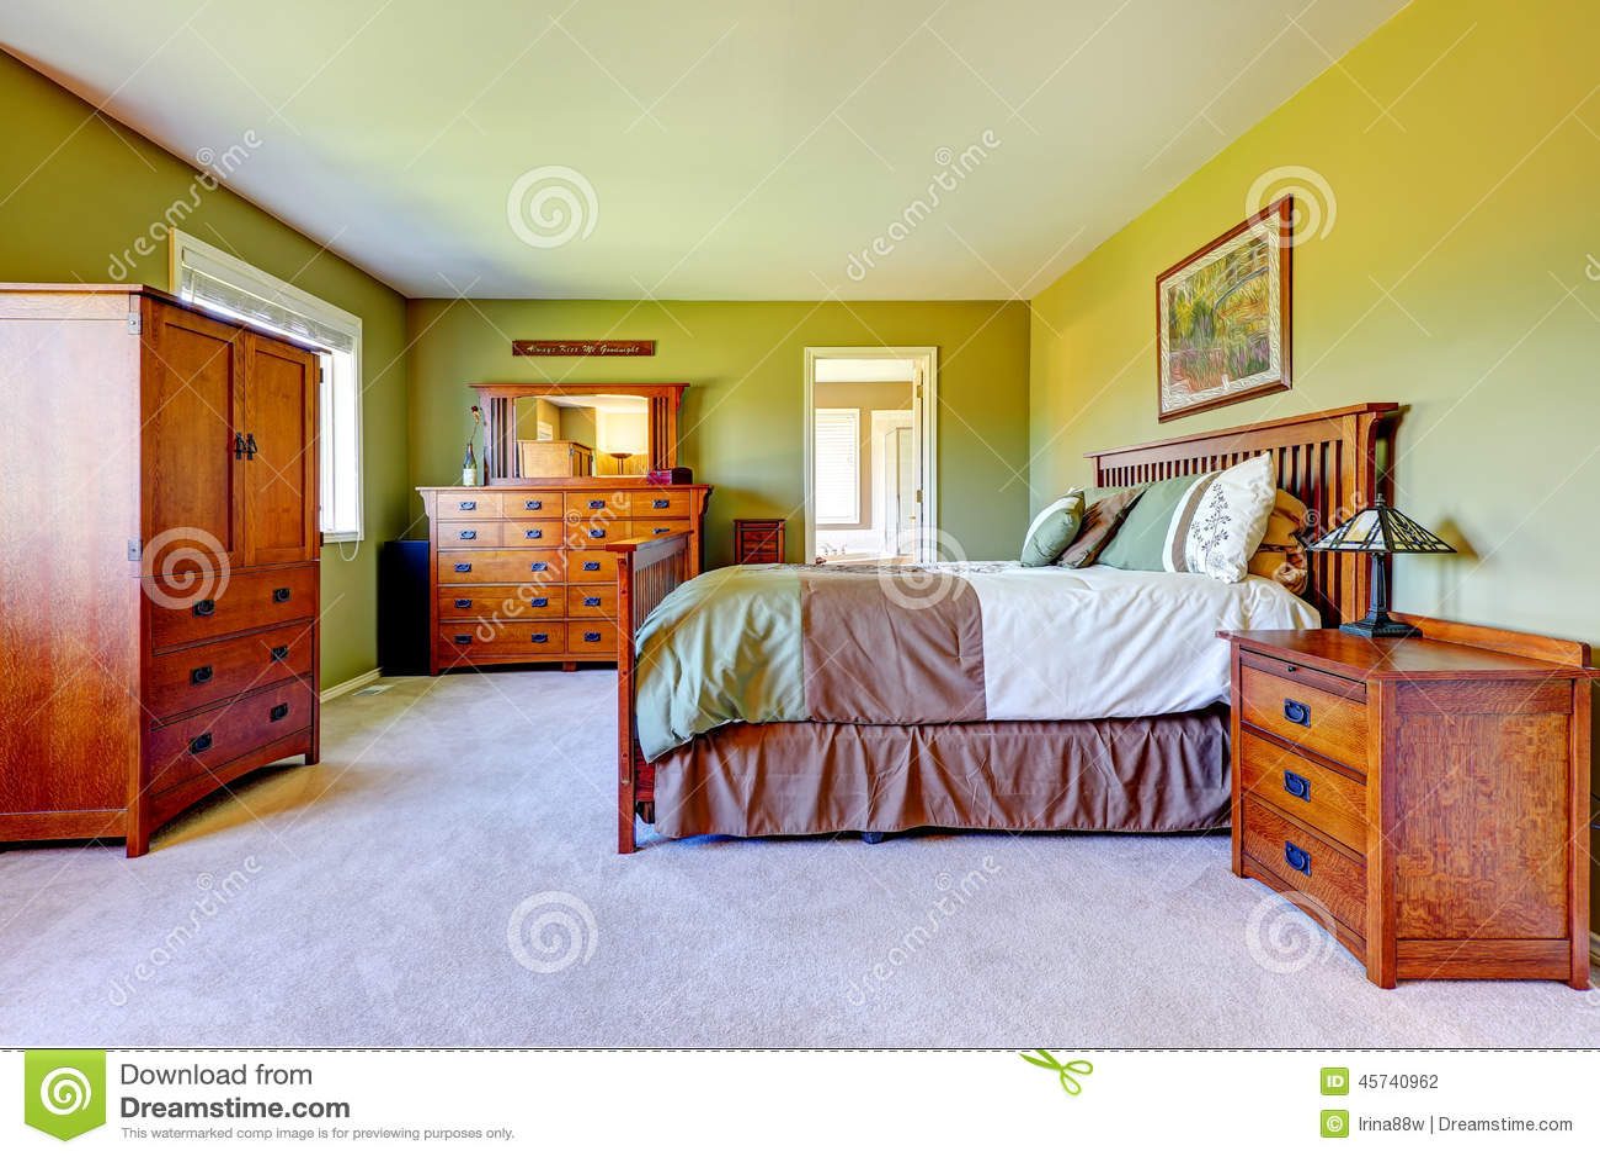 Master Bedroom Interior In Bright Green Color Stock Image